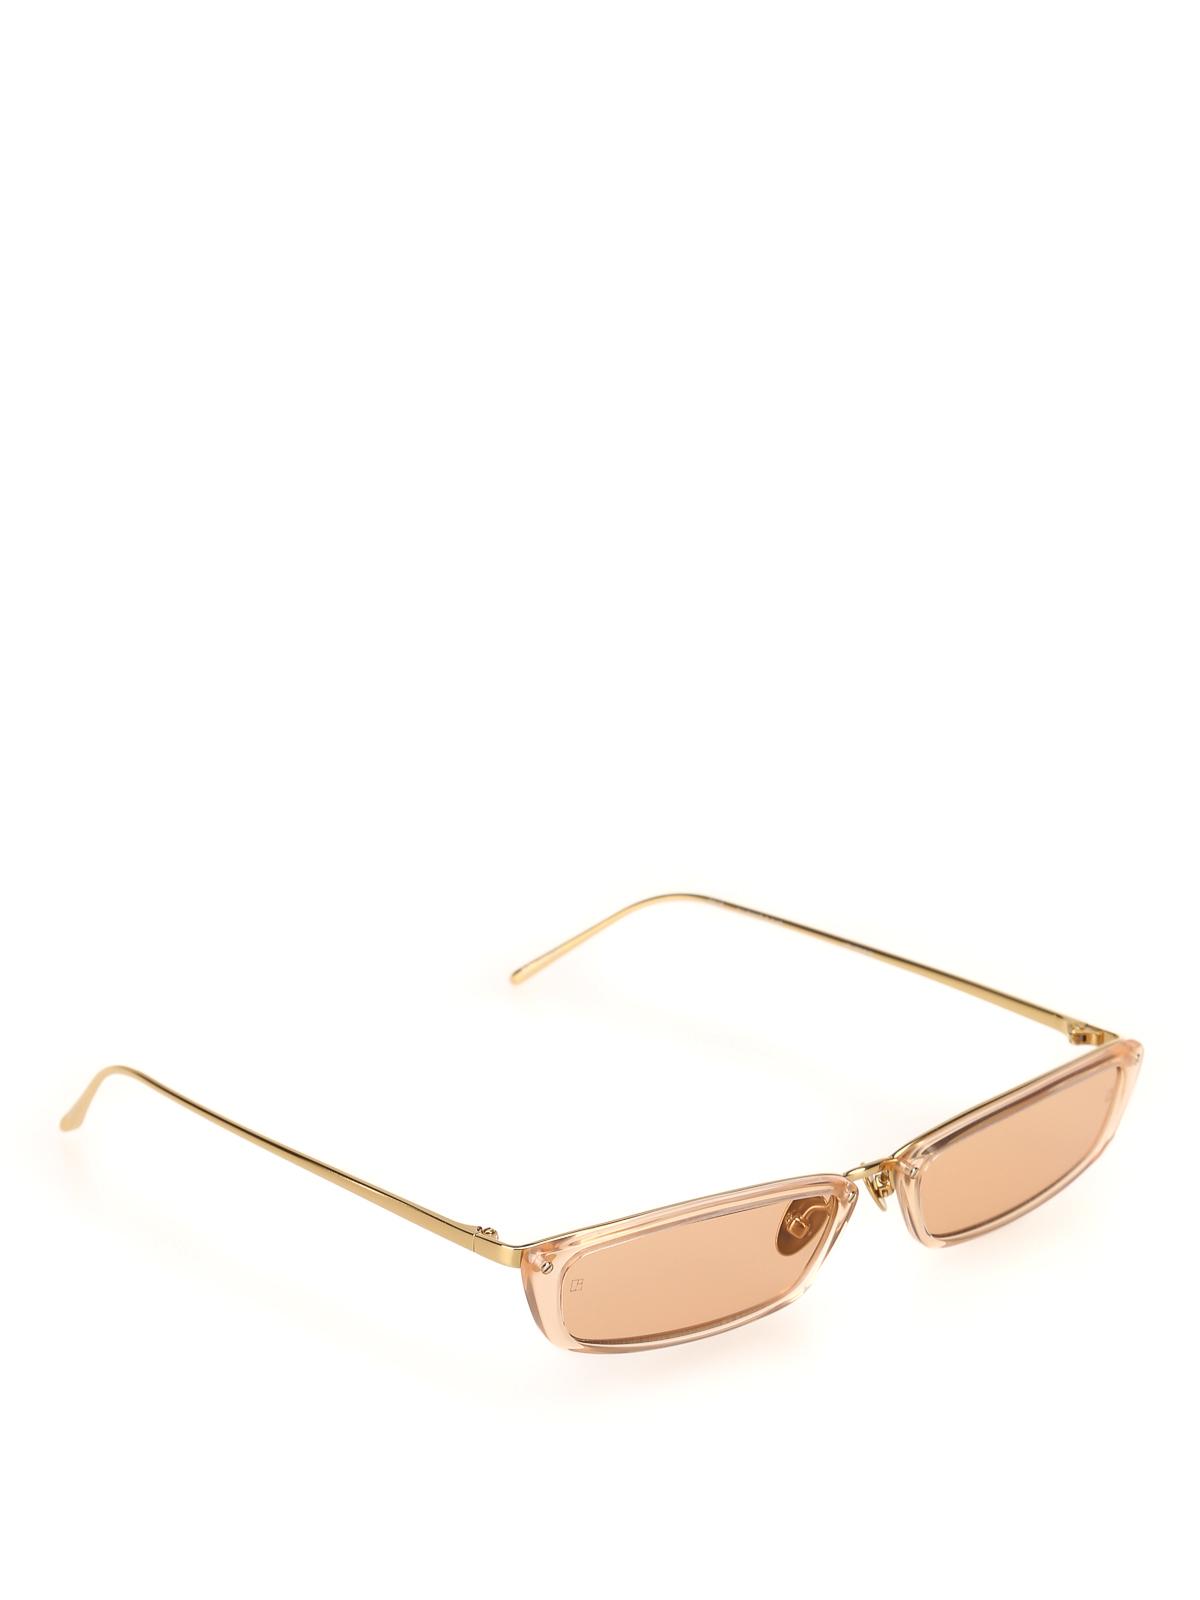 Linda Farrow Peach Super Skinny Sunglasses In Light Pink